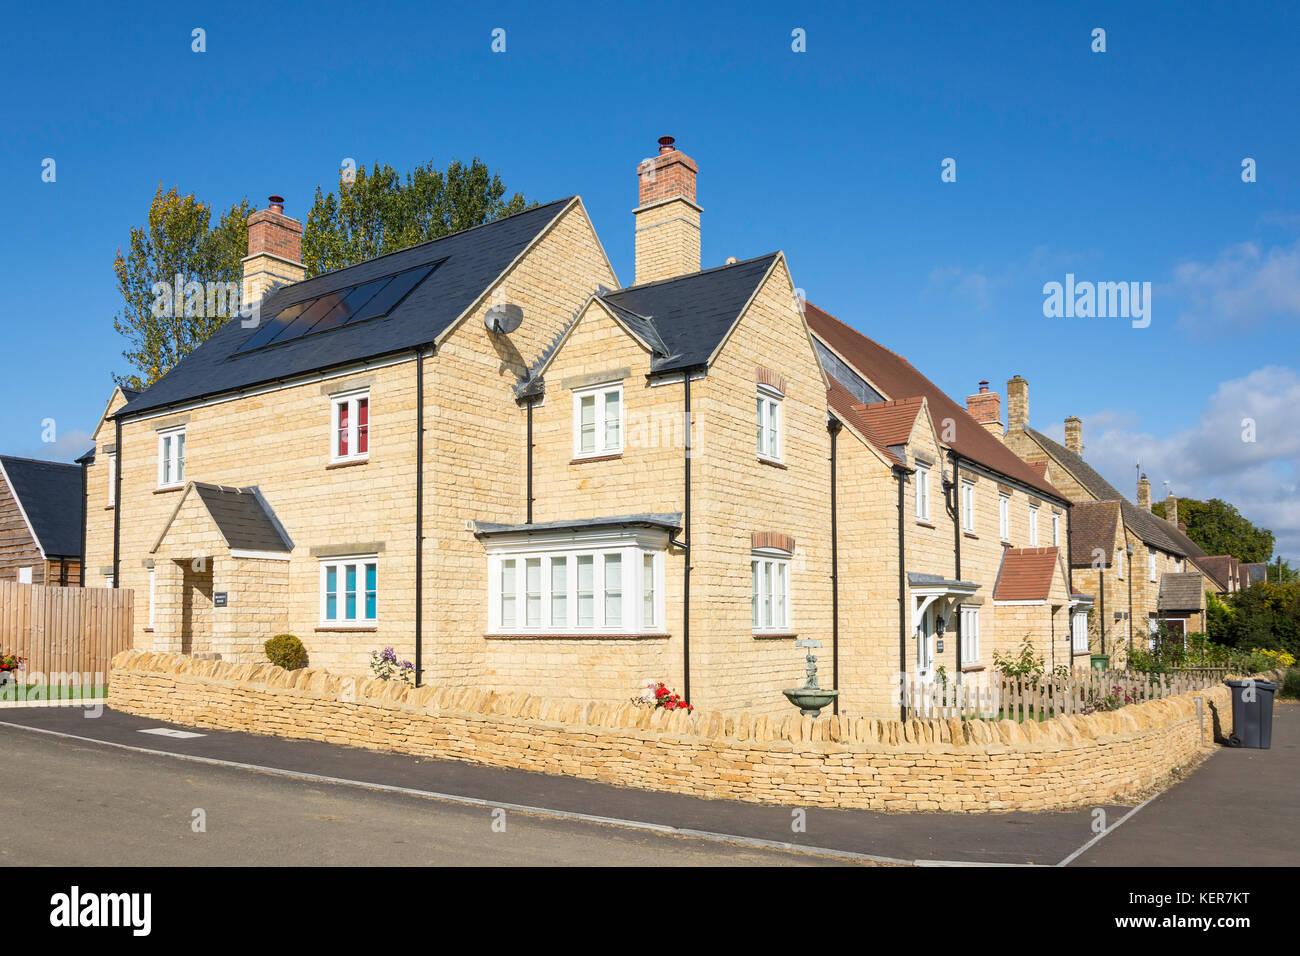 Orchard View cottage development, Main Street, Long Compton, Warwickshire, England, United Kingdom - Stock Image